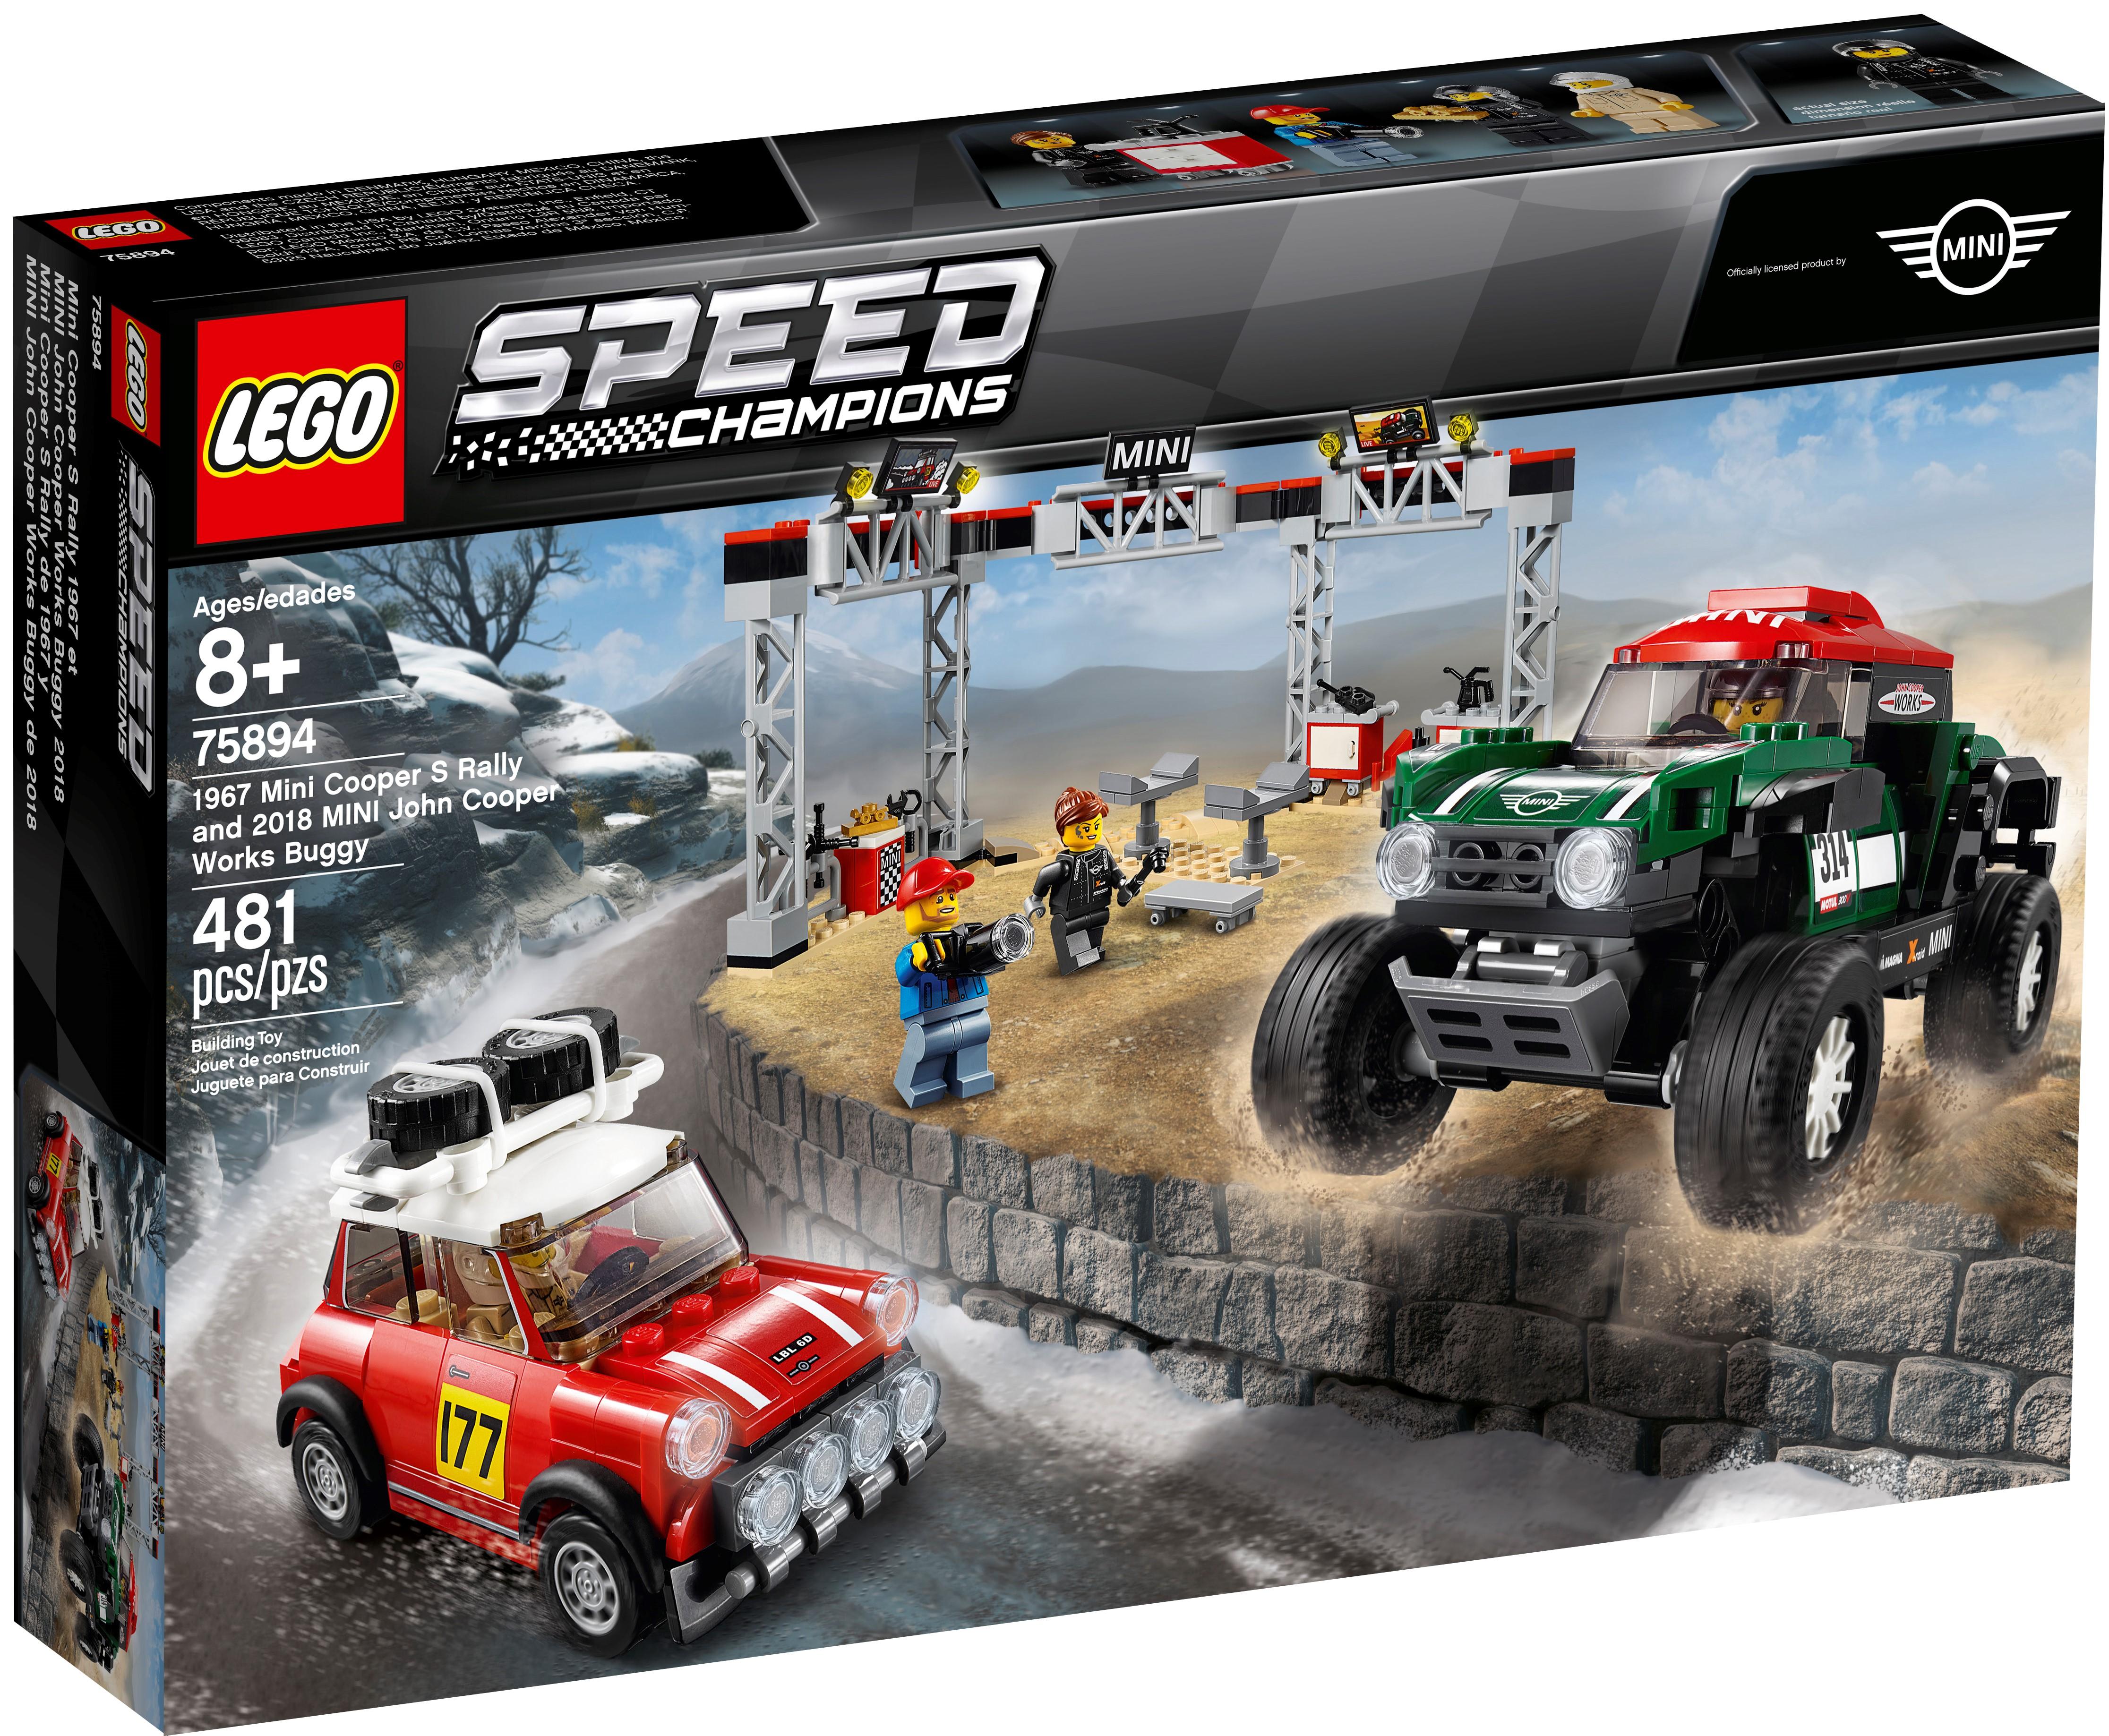 Lego MINI John Cooper Works Buggy Fahrer Speed Champions Minifigur sc070 Neu